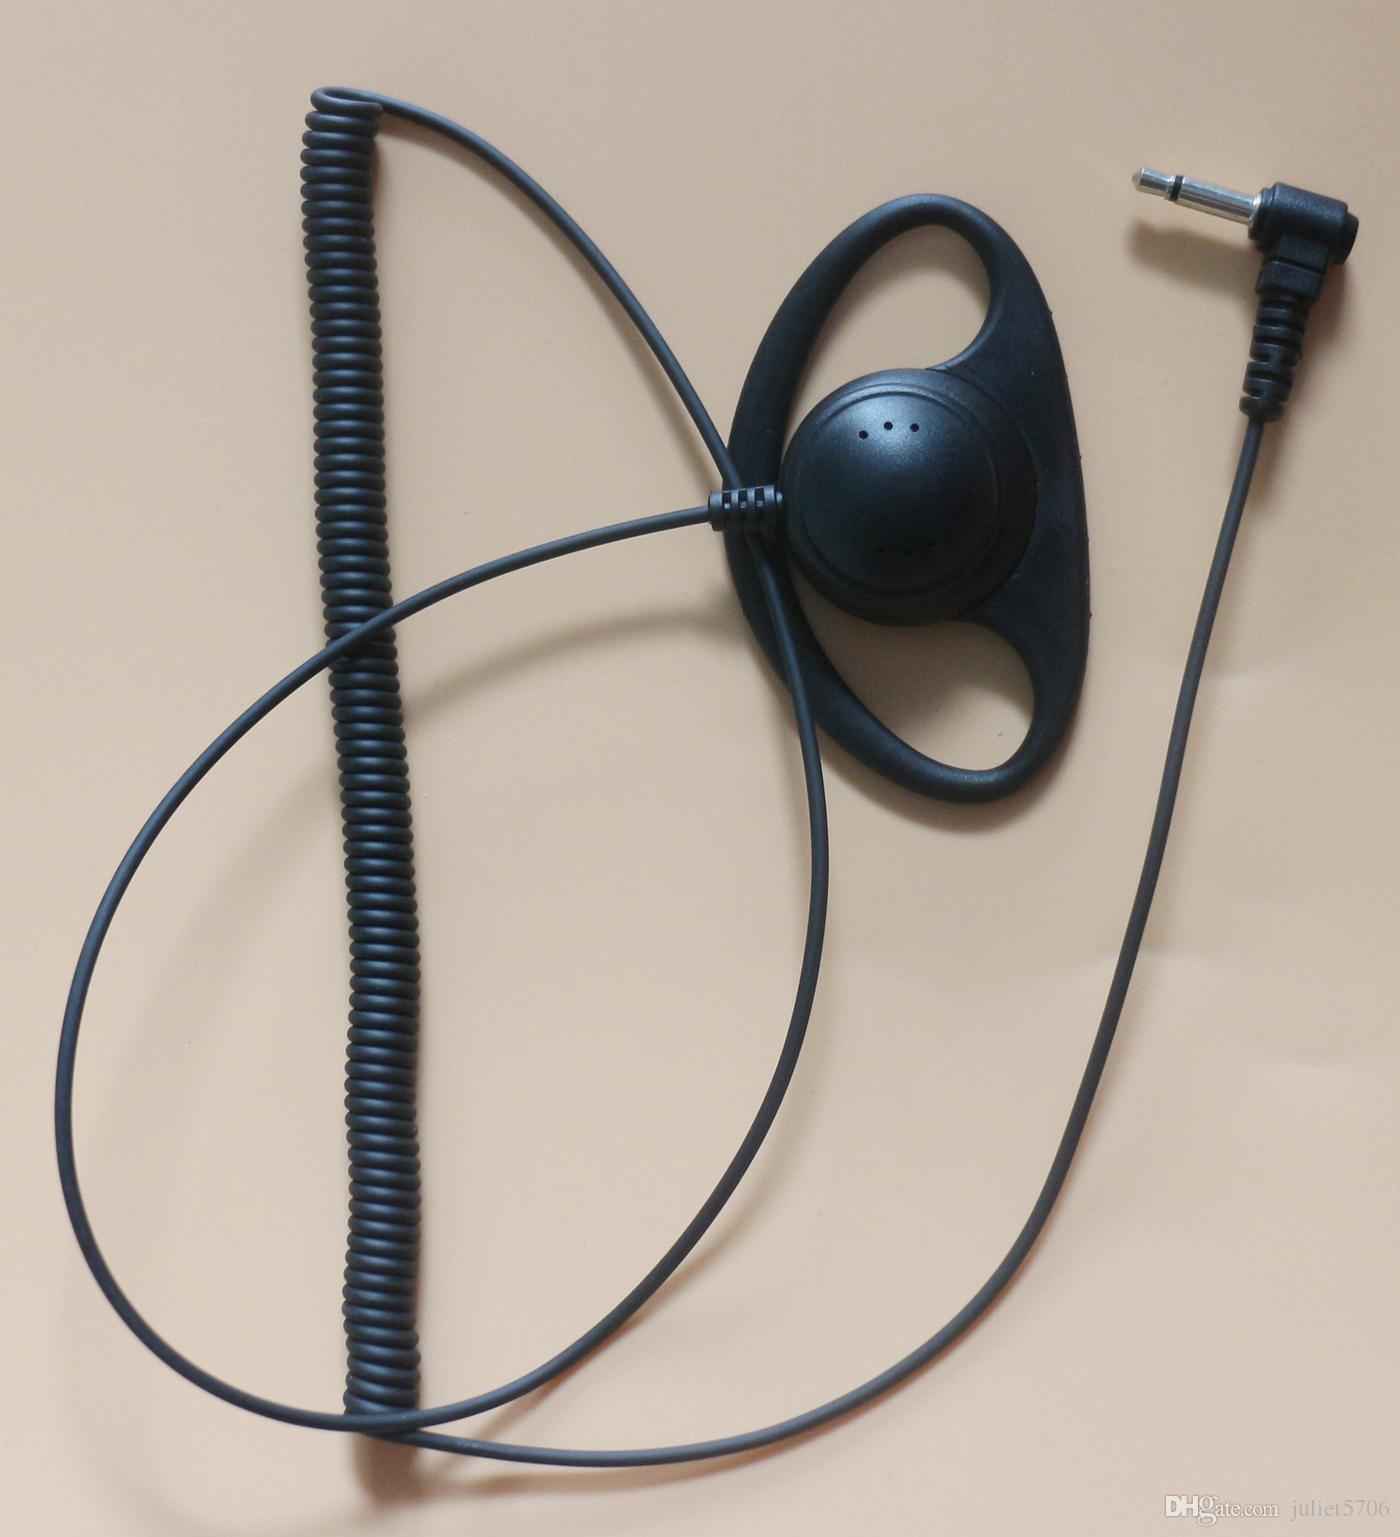 10pcs New 1-Pin D-Shape Receive Listen Only Earphone Earpiece Headset Mic  For Motorola 2/Two-way Radio APX 7000 XTS5000 XTS3500 XTS3000